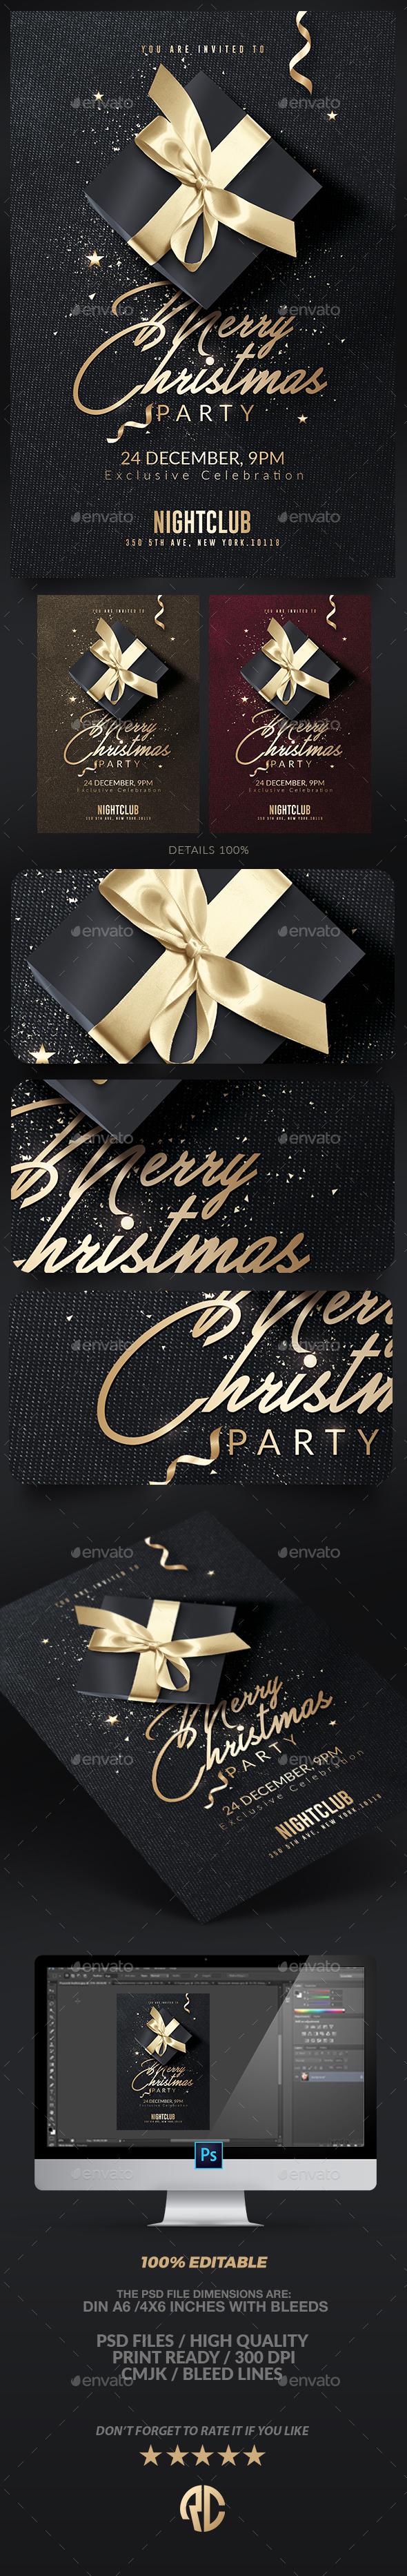 Classy Christmas Invitation | Psd Flyer - Events Flyers